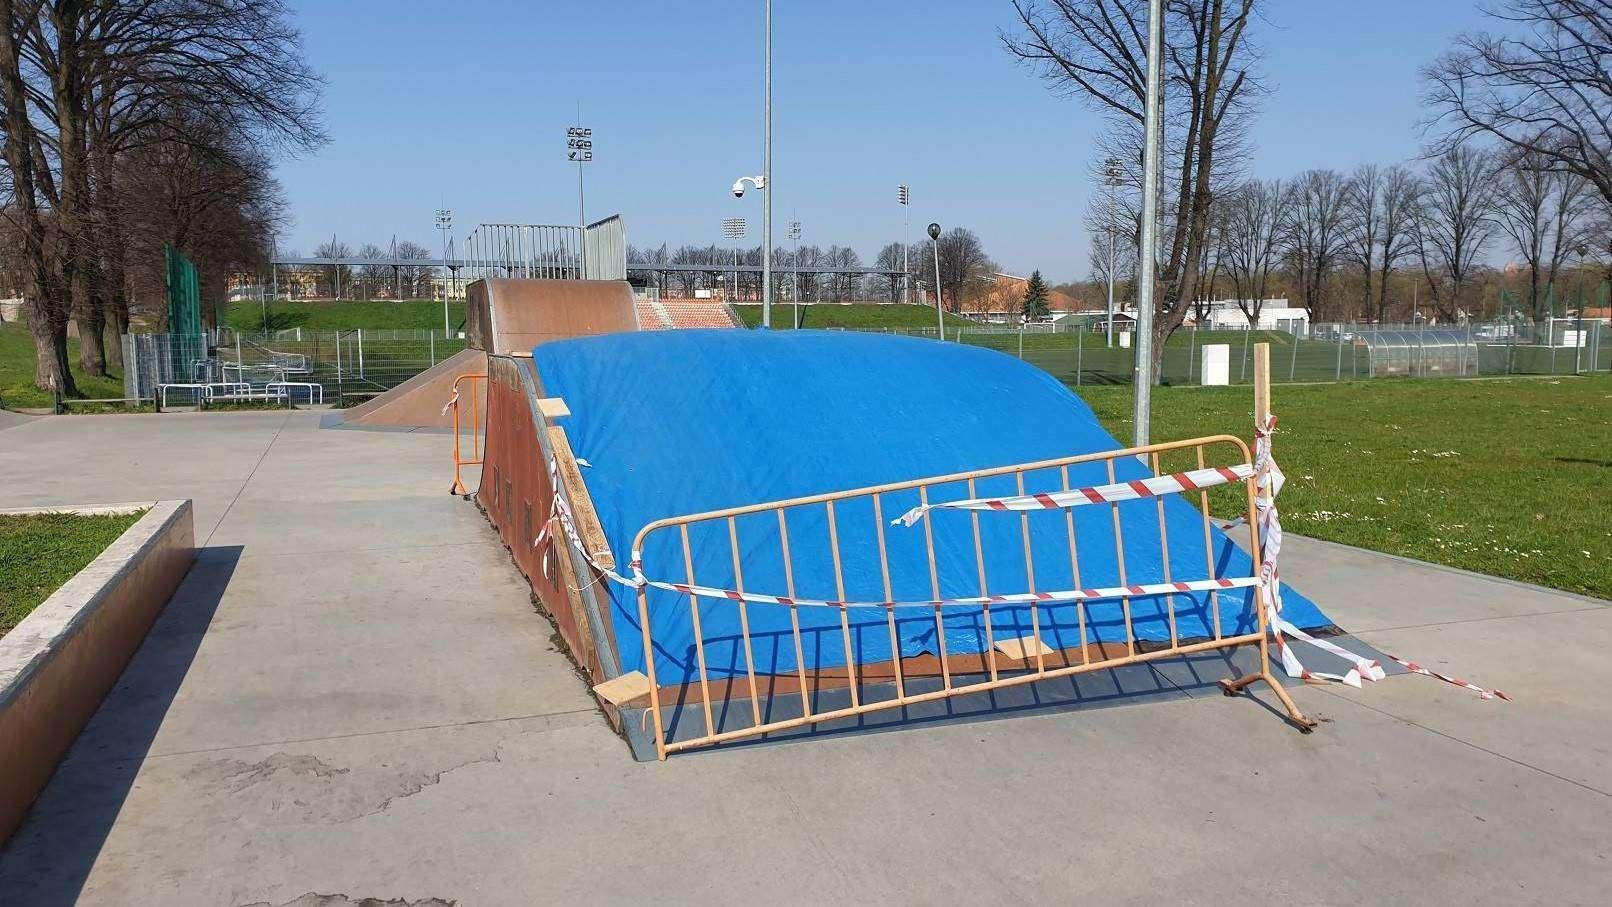 2021-04-22 skatepark Chrobry Głogów (fot. M. Kaczmarek) (6)